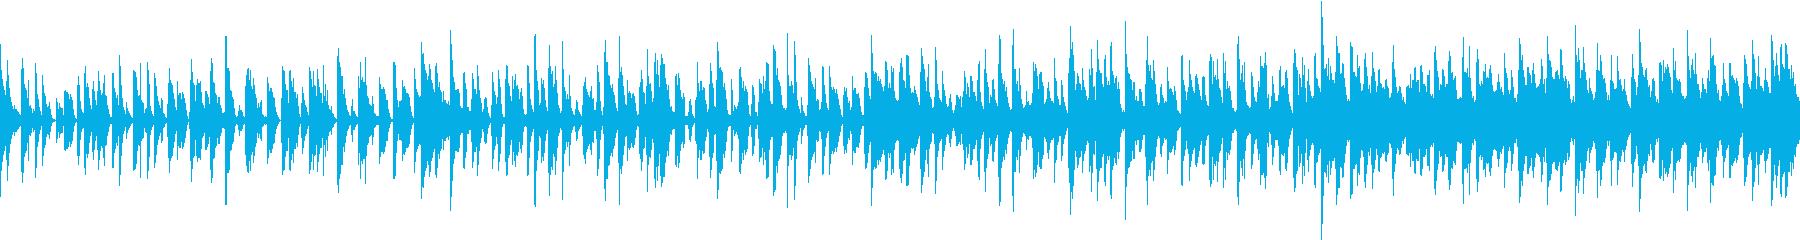 CM用30秒 軽快で妖艶なラテンポップの再生済みの波形